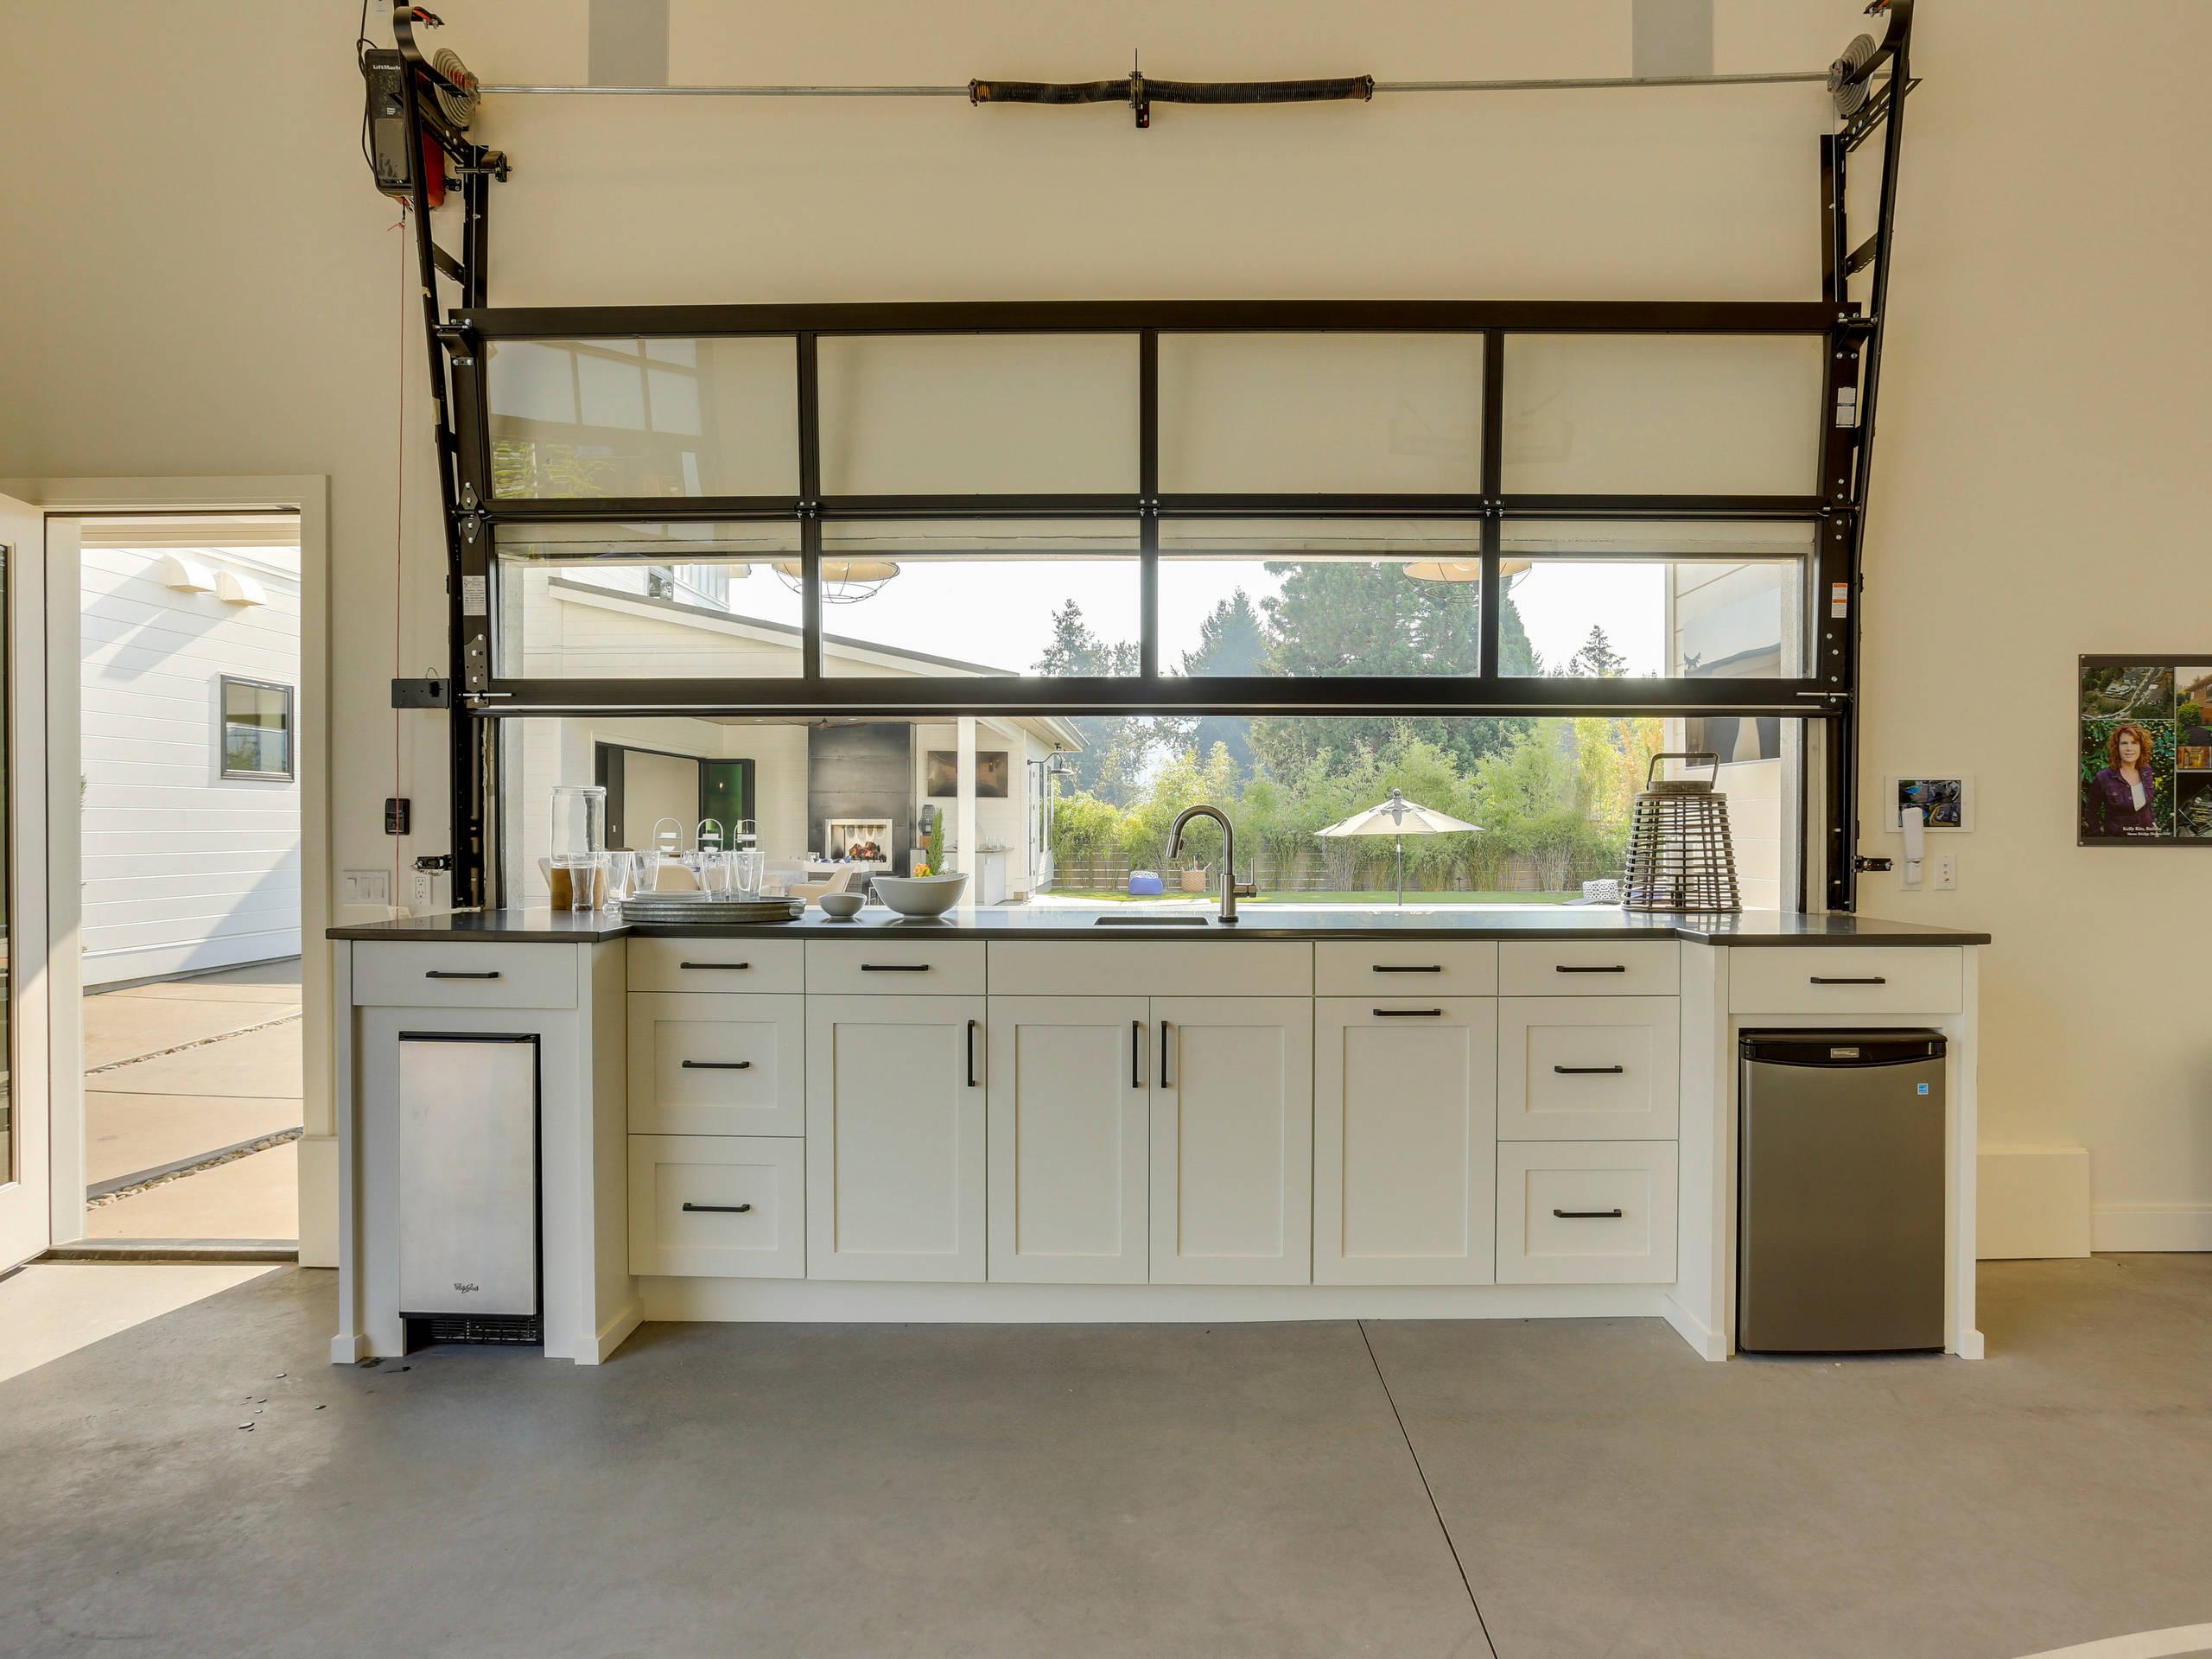 18 Beautiful Detached Garage Pictures Ideas October 2020 Houzz